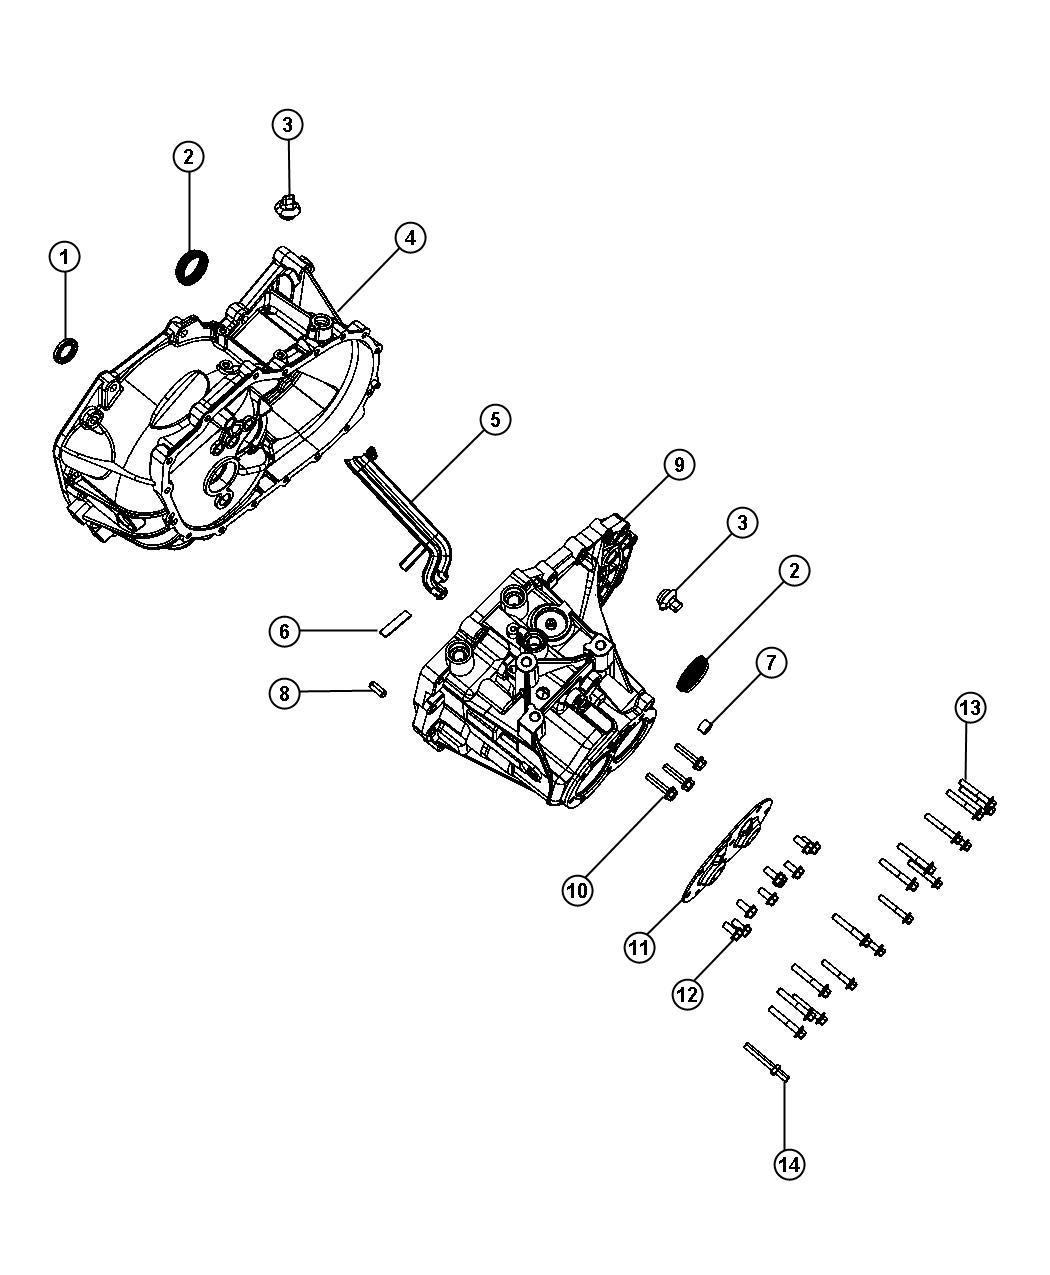 Jeep Compass Case Transmission Power Train Module